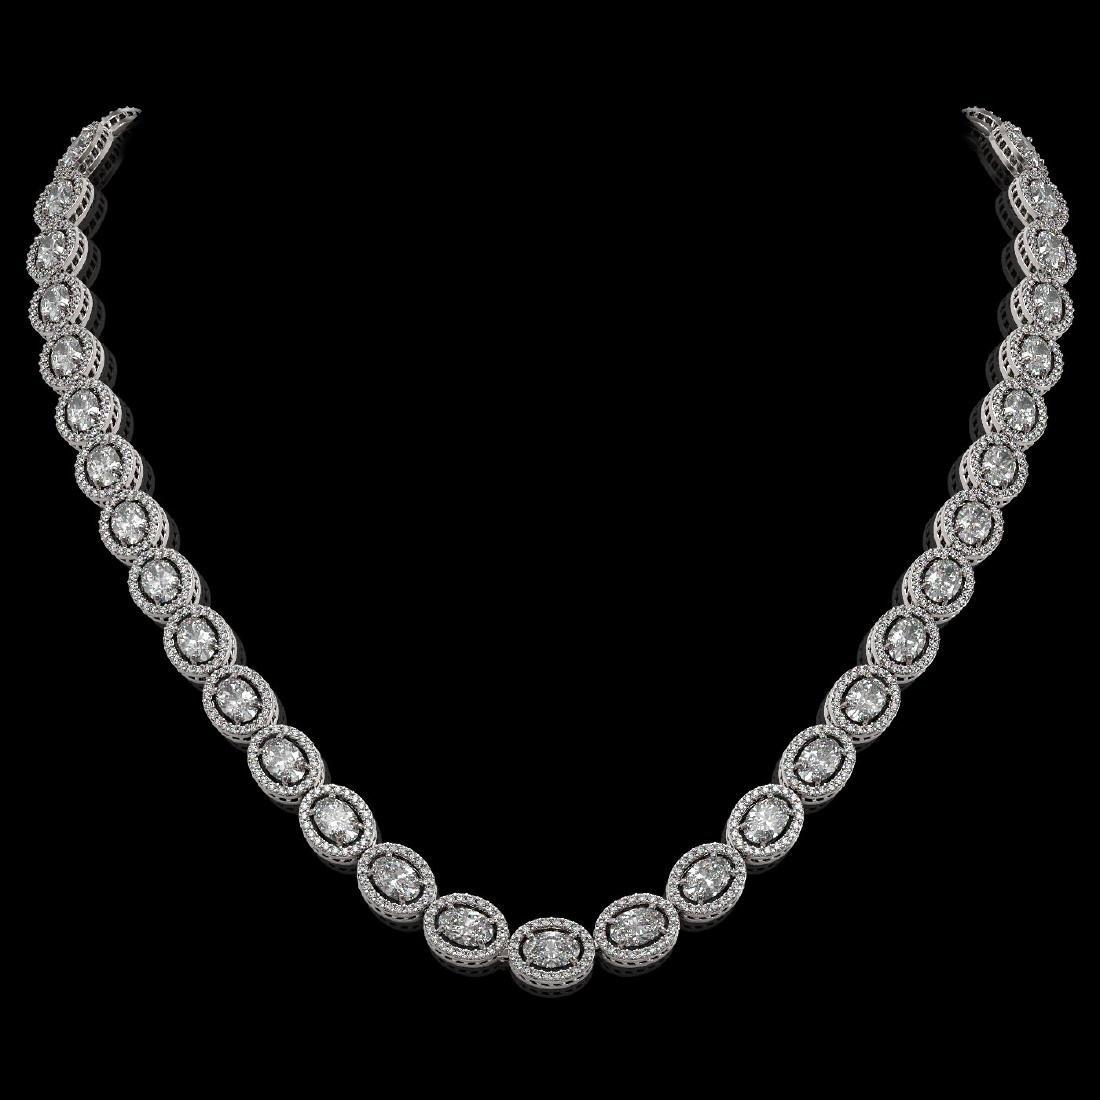 30.41 CTW Oval Diamond Designer Necklace 18K White Gold